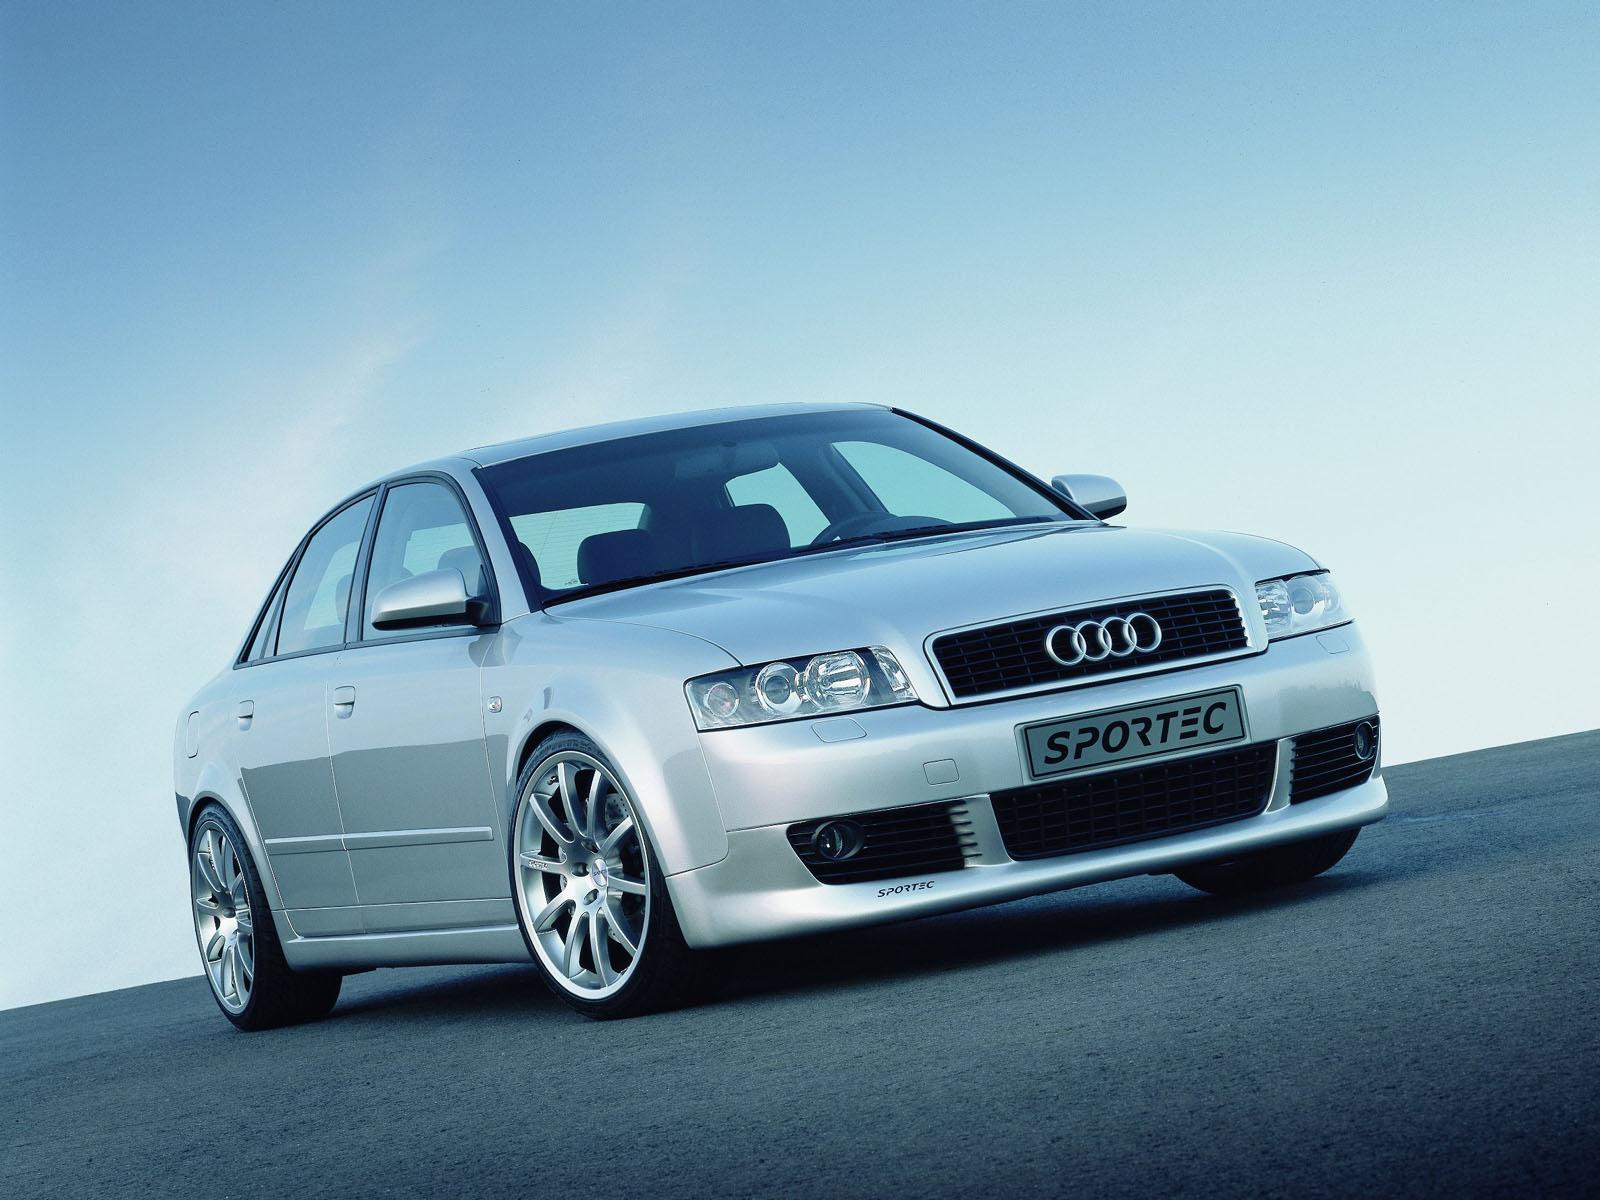 Sportec audi a4 sedan rs310 picture 14016 sportec for Audi a4 interieur tuning